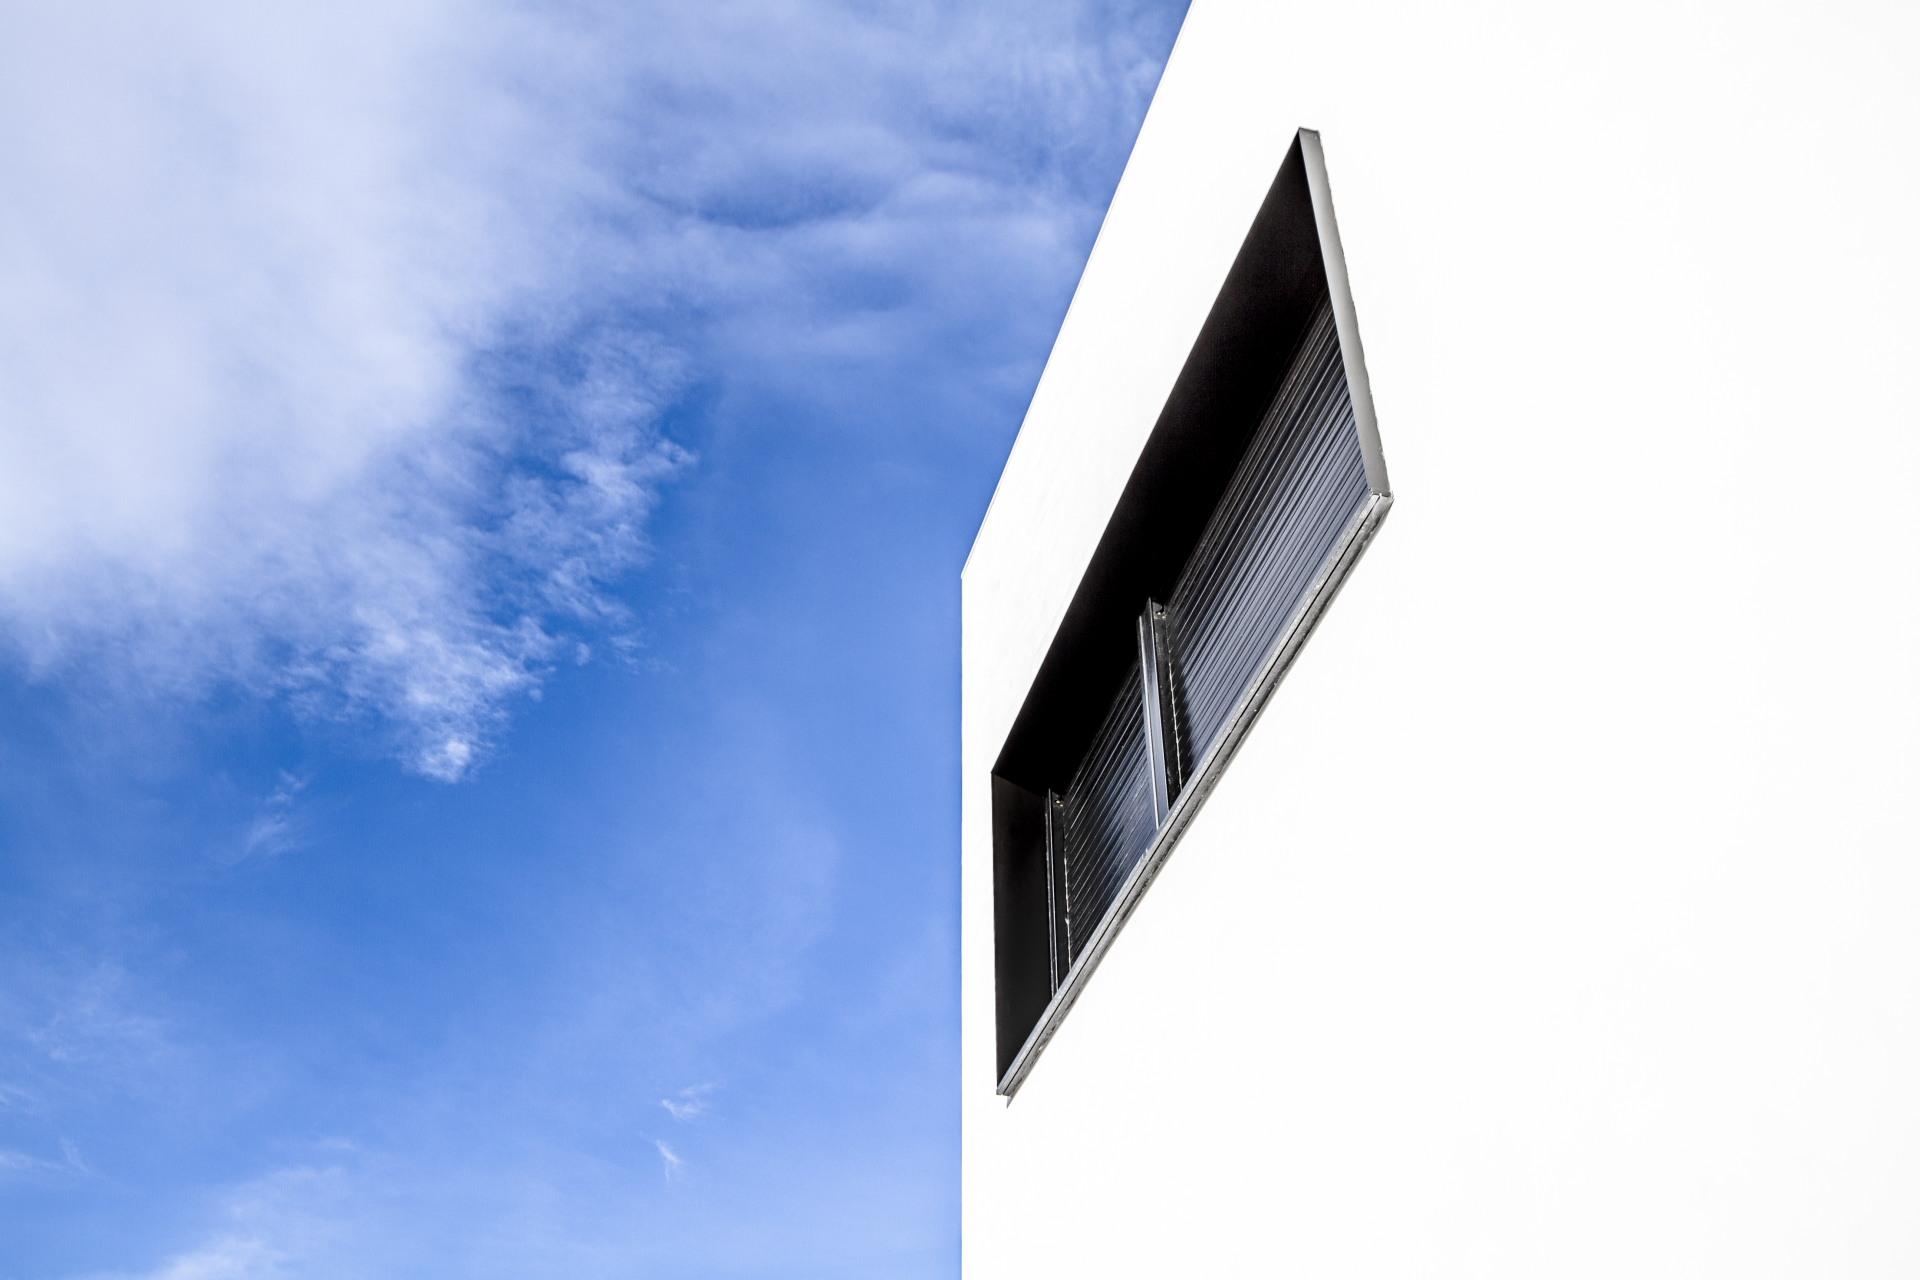 fotografia-arquitectura-valencia-german-cabo-viraje-v01 (4)